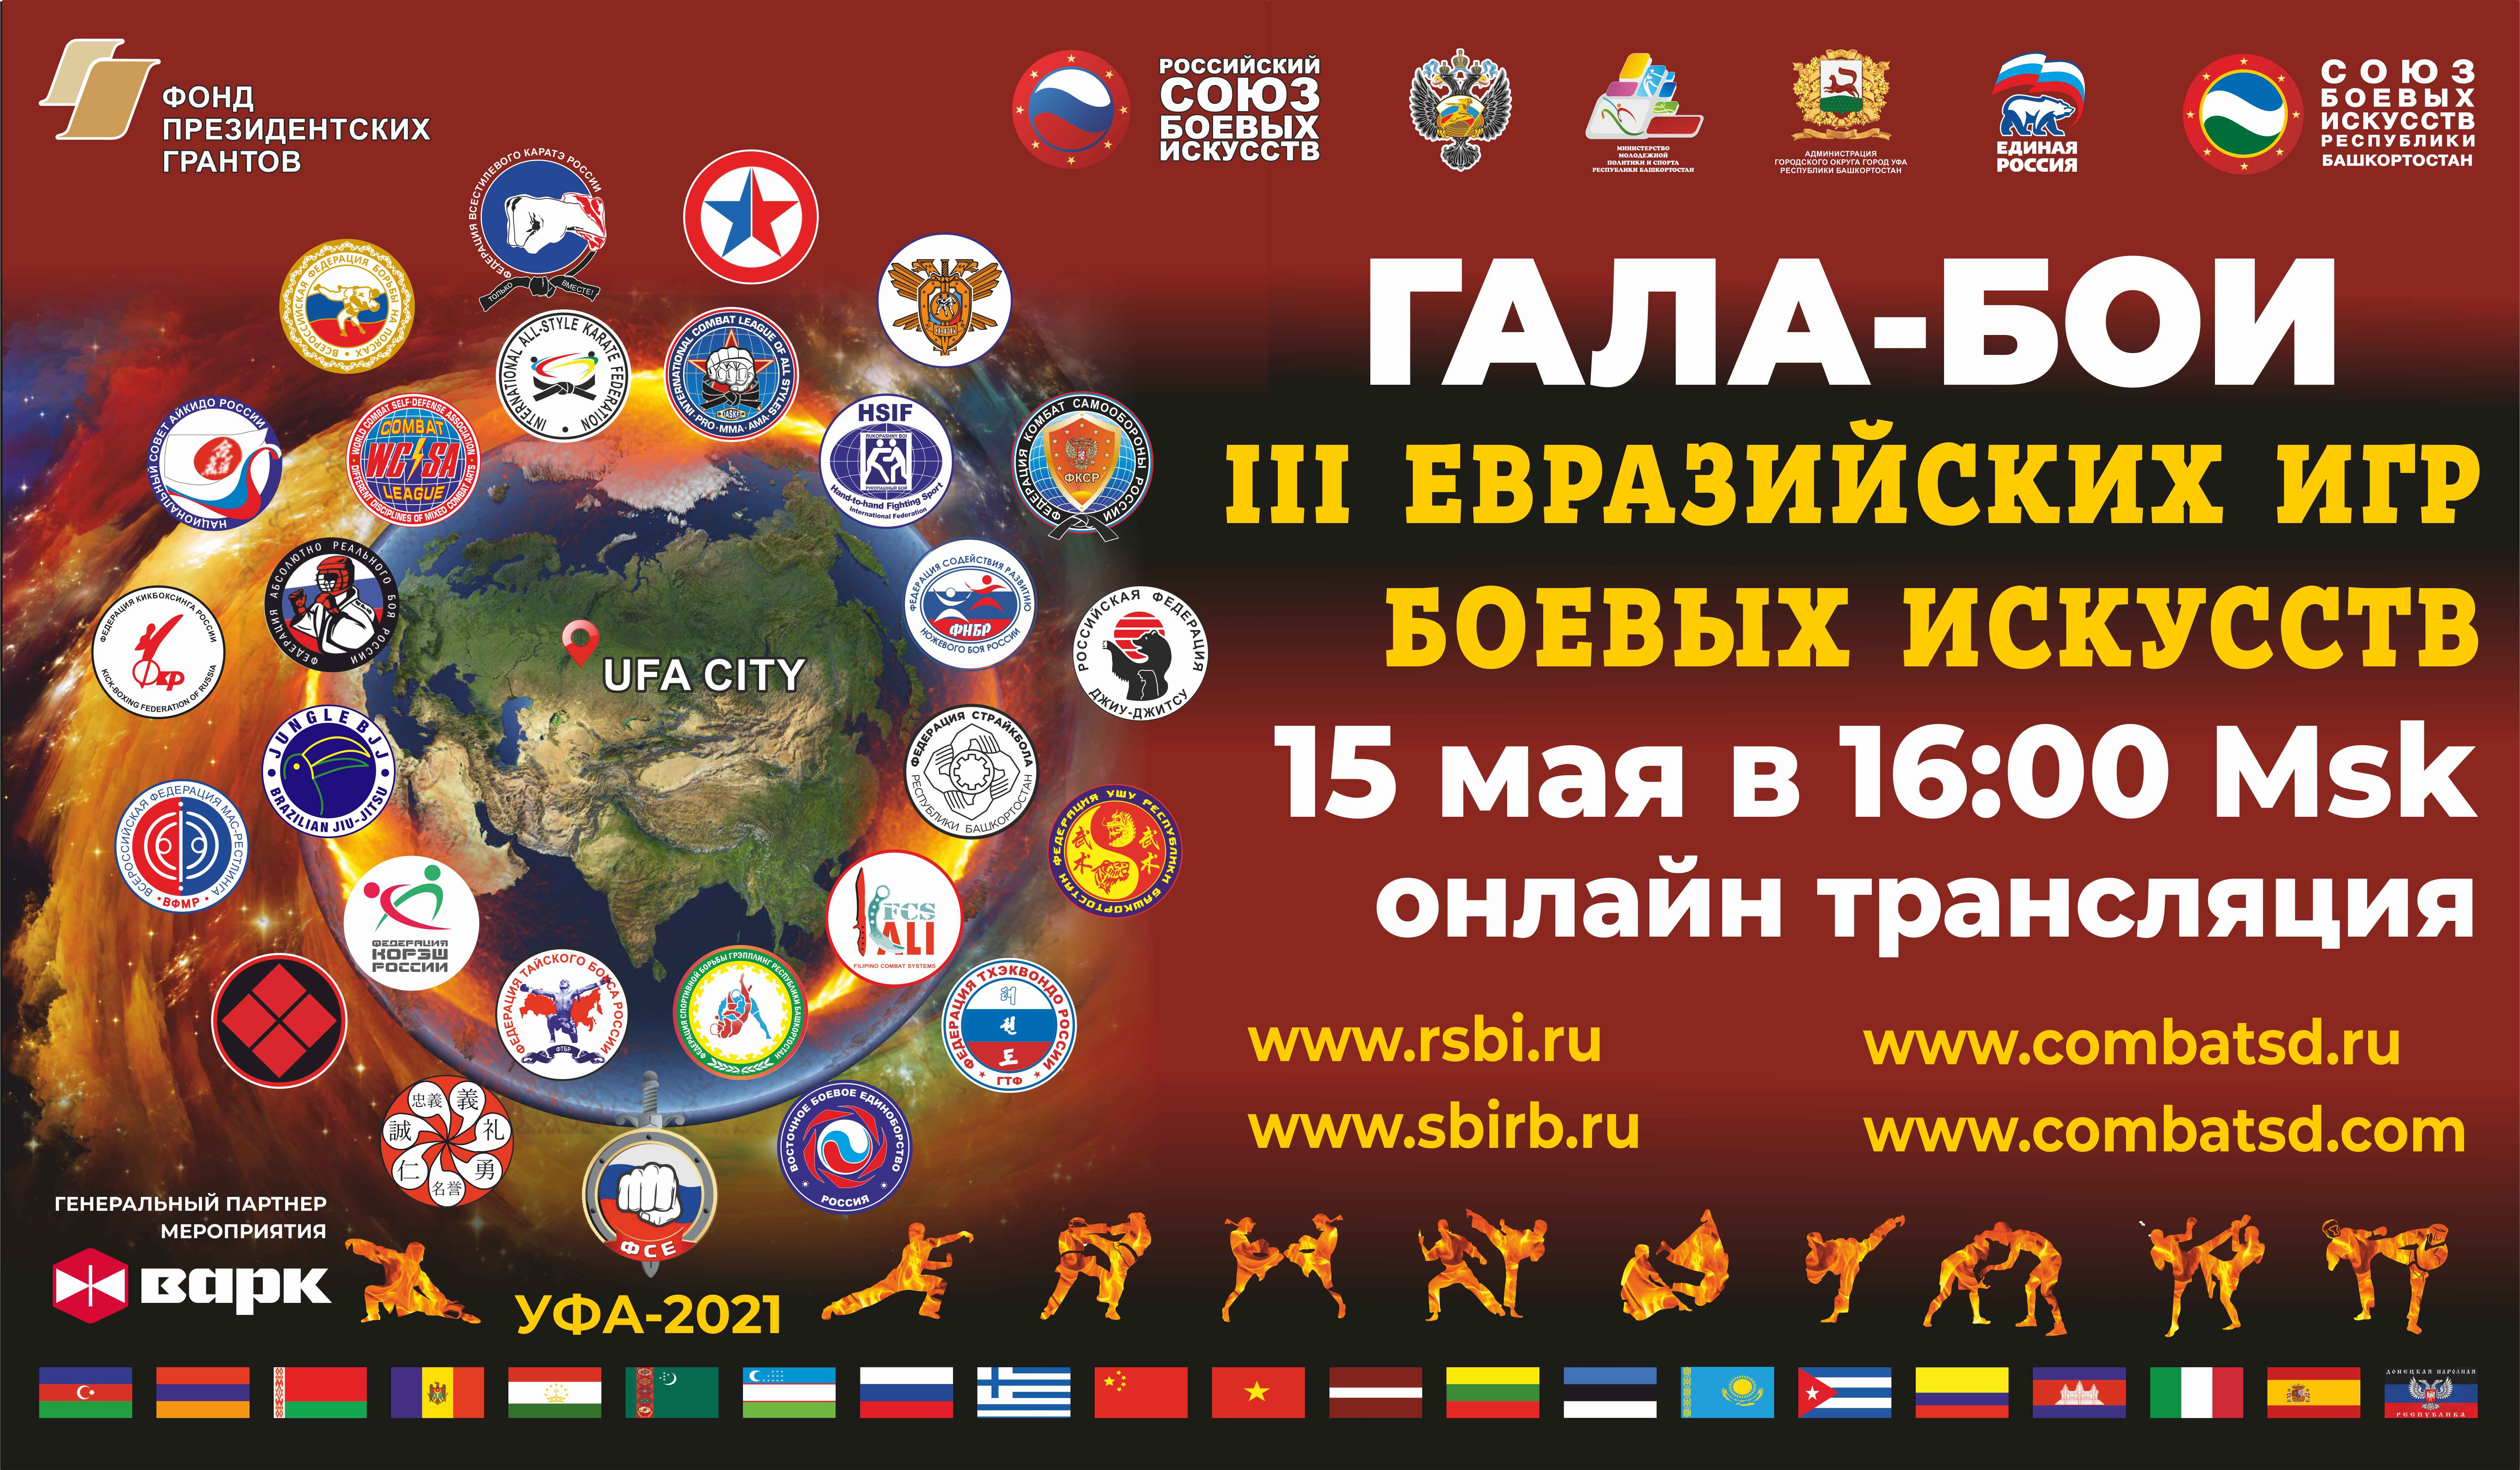 http://sbirb.combatsd.ru/images/upload/Афиша%20Гала-программа%20(15%20мая).jpg